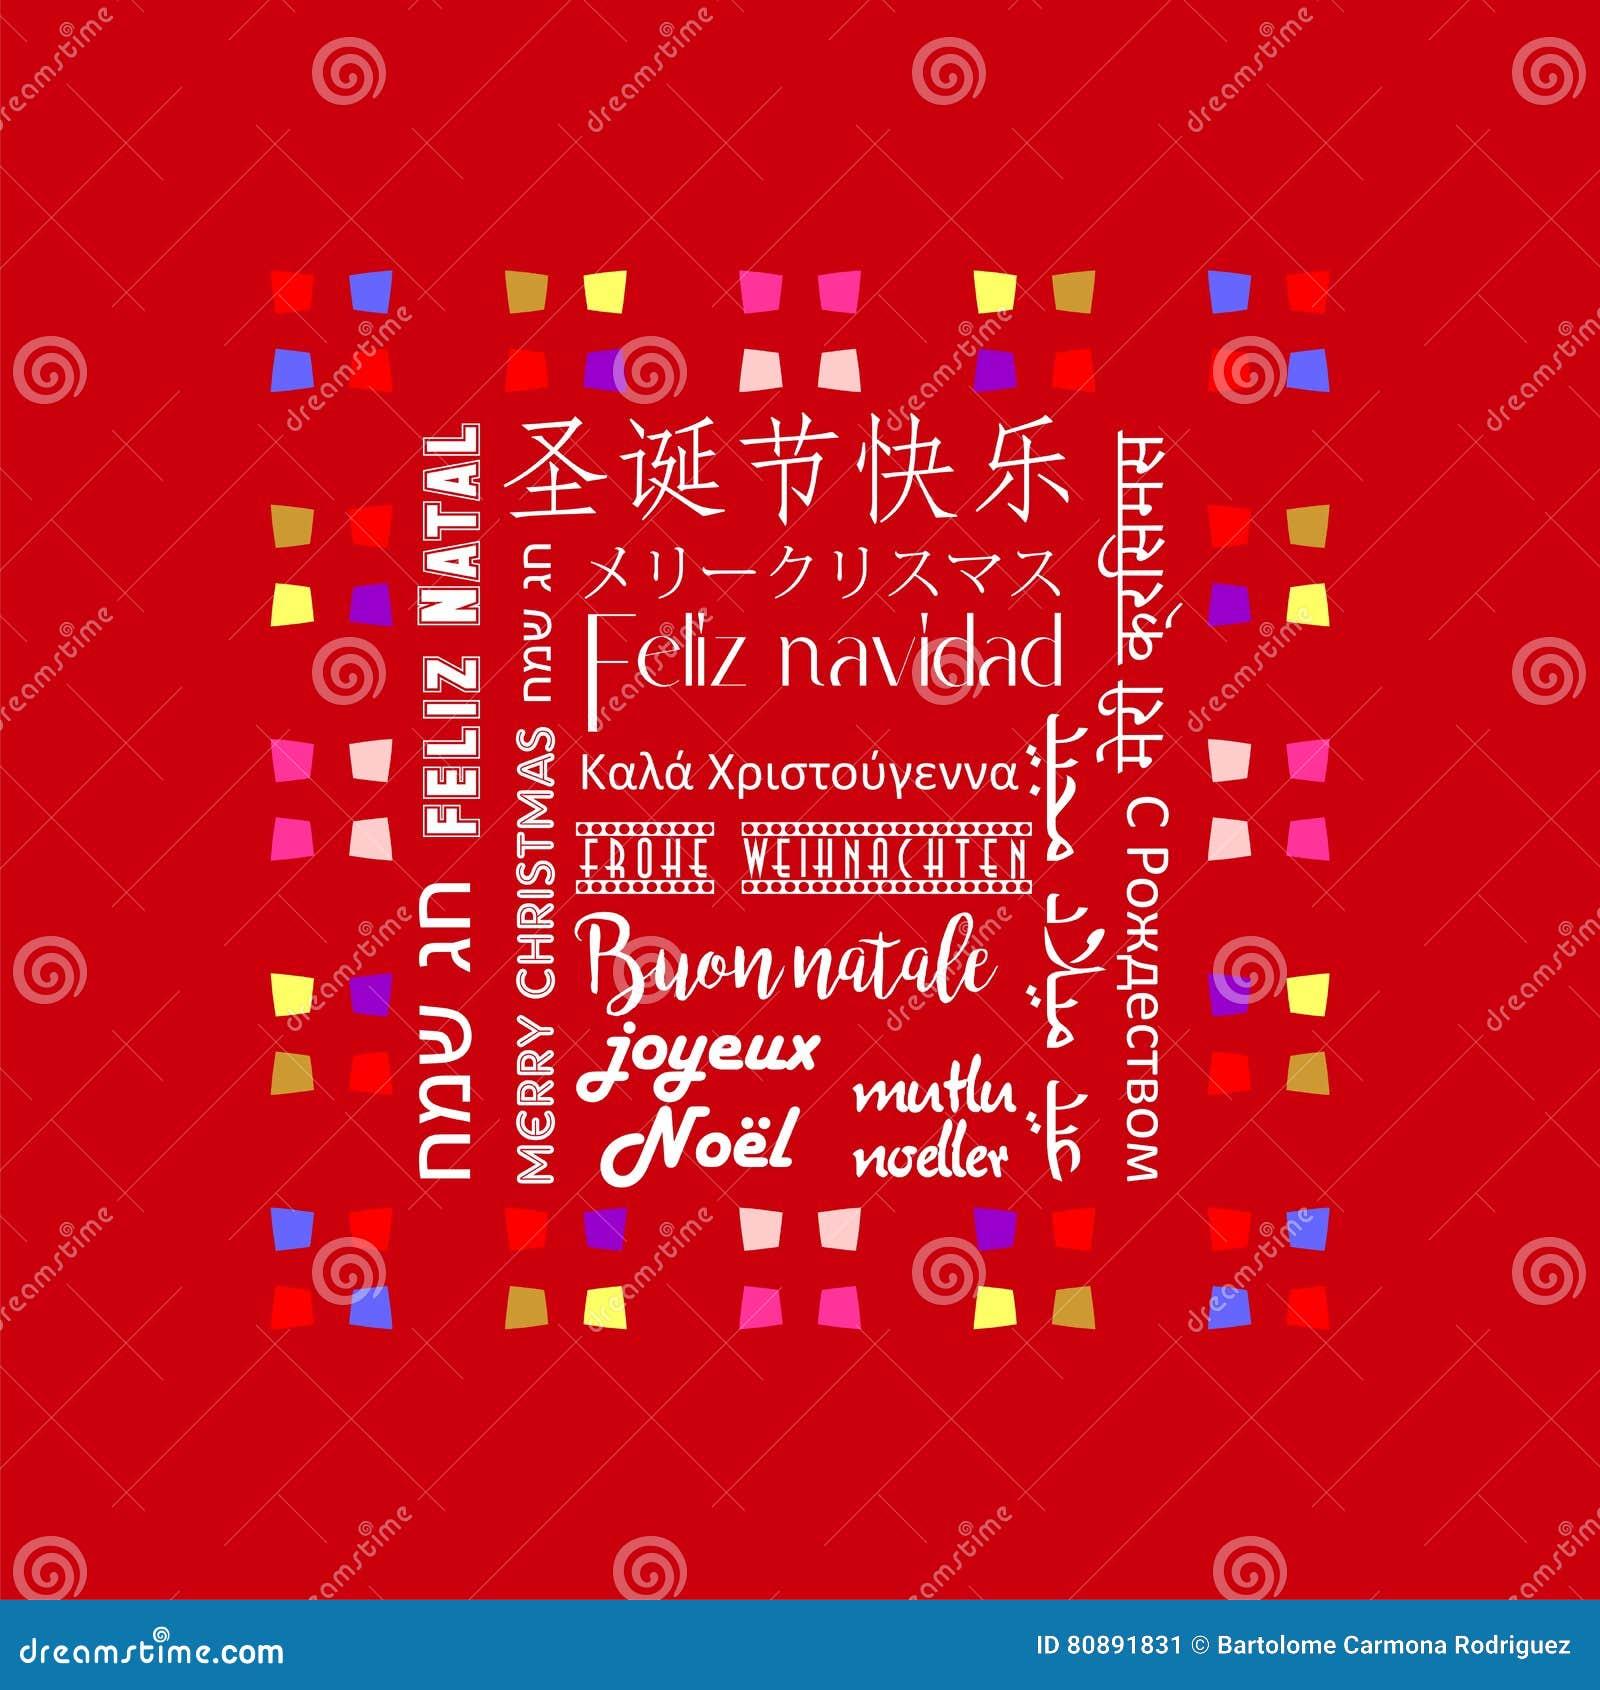 Auguri Di Buon Natale In Cinese.Cartolina D Auguri Variopinta Di Natale Scritta In Parecchie Lingue